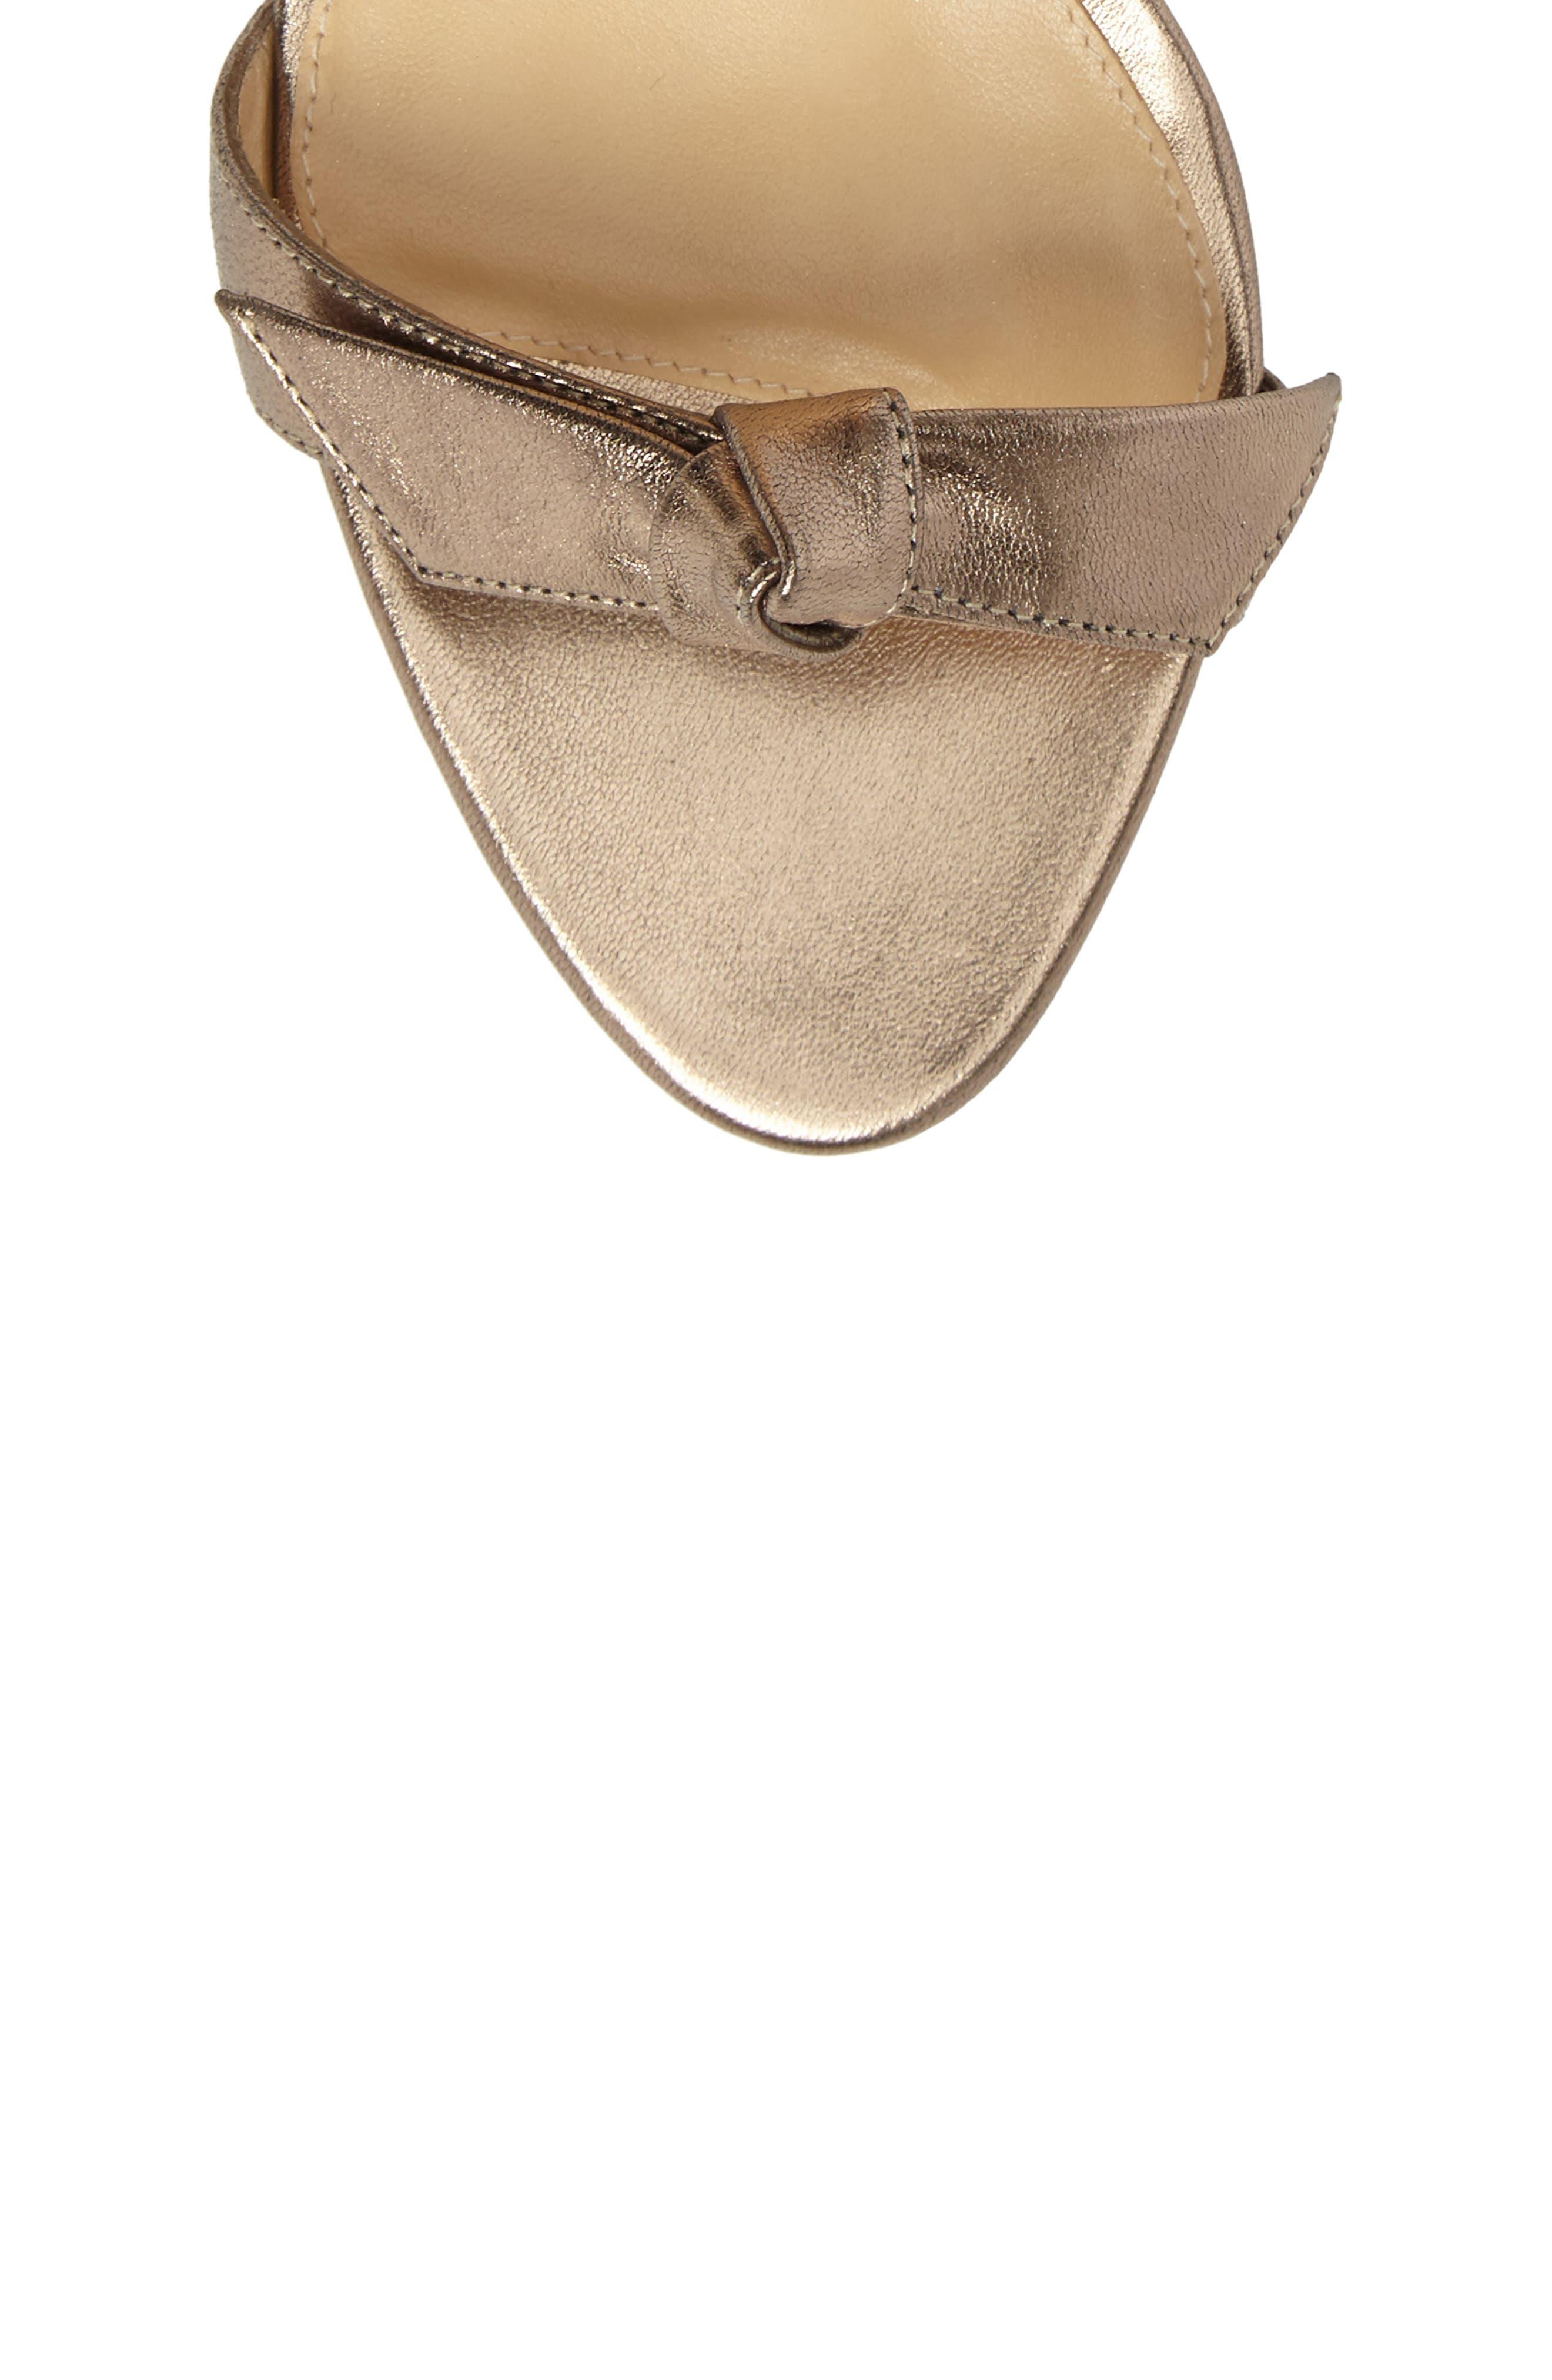 Clarita Ankle Tie Sandal,                             Alternate thumbnail 5, color,                             METALLIC GOLD LEATHER